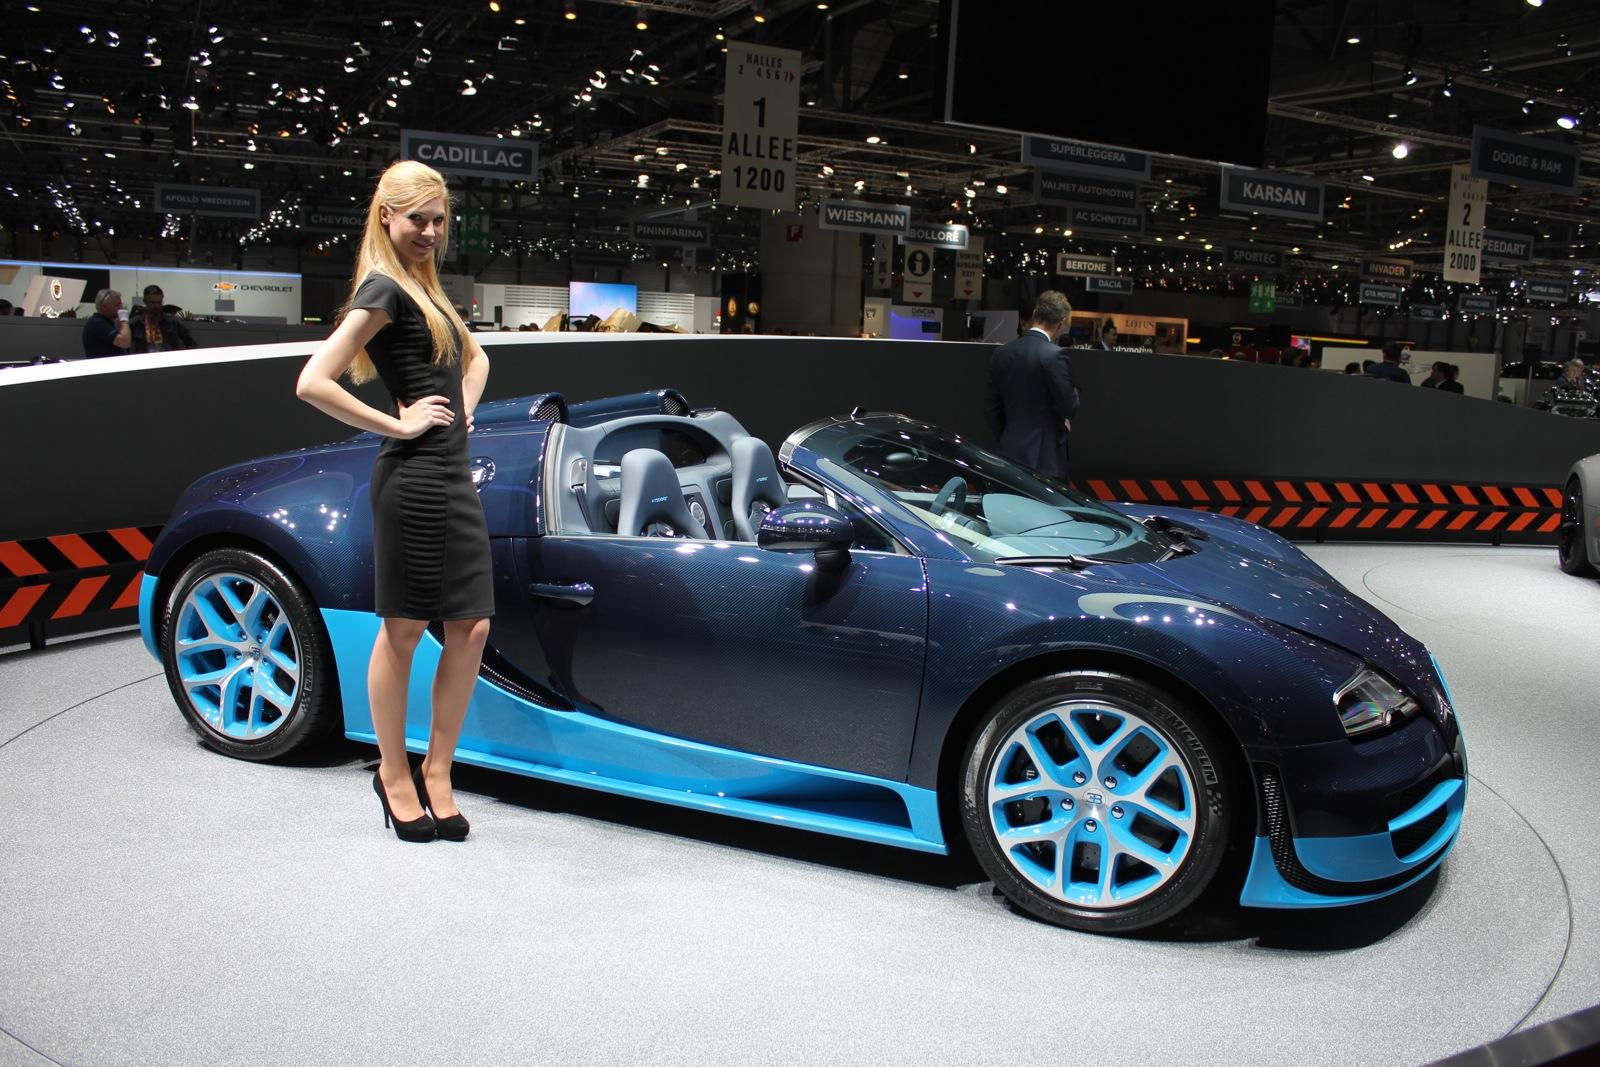 bugatti veyron grand sport vitesse live photos 2012 geneva motor show. Black Bedroom Furniture Sets. Home Design Ideas